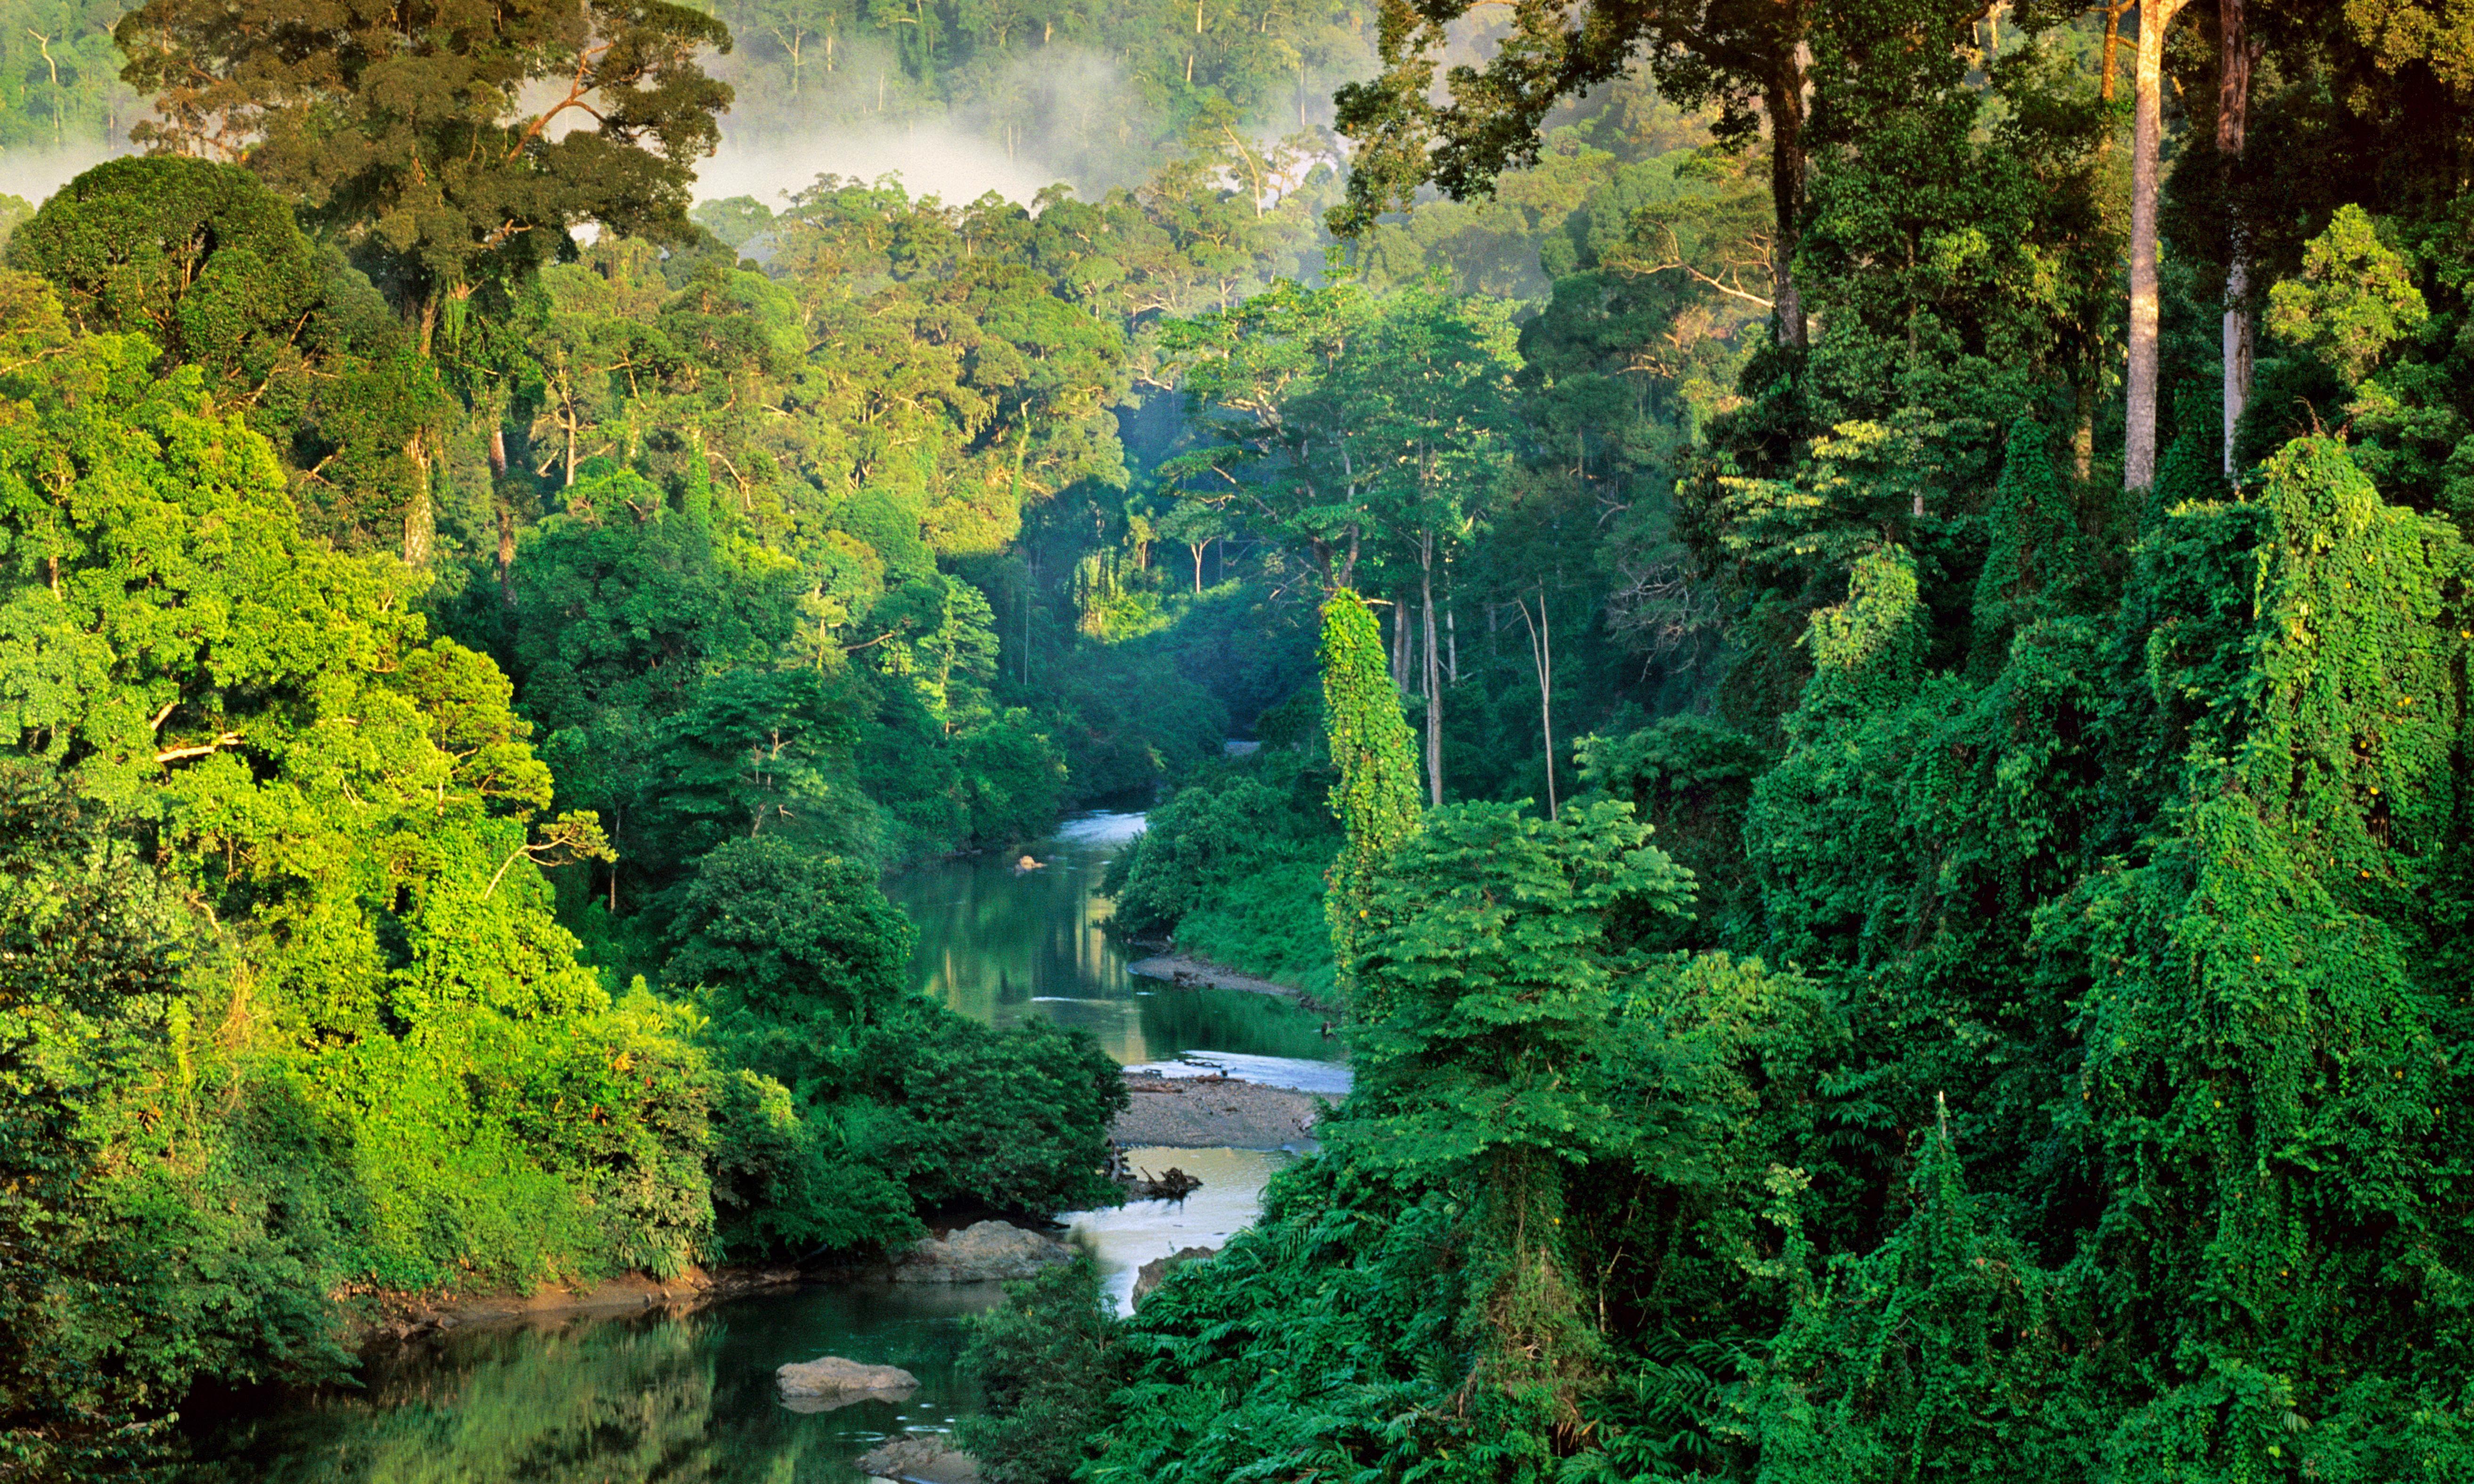 Franz Lanting Photo Of A Rainforest